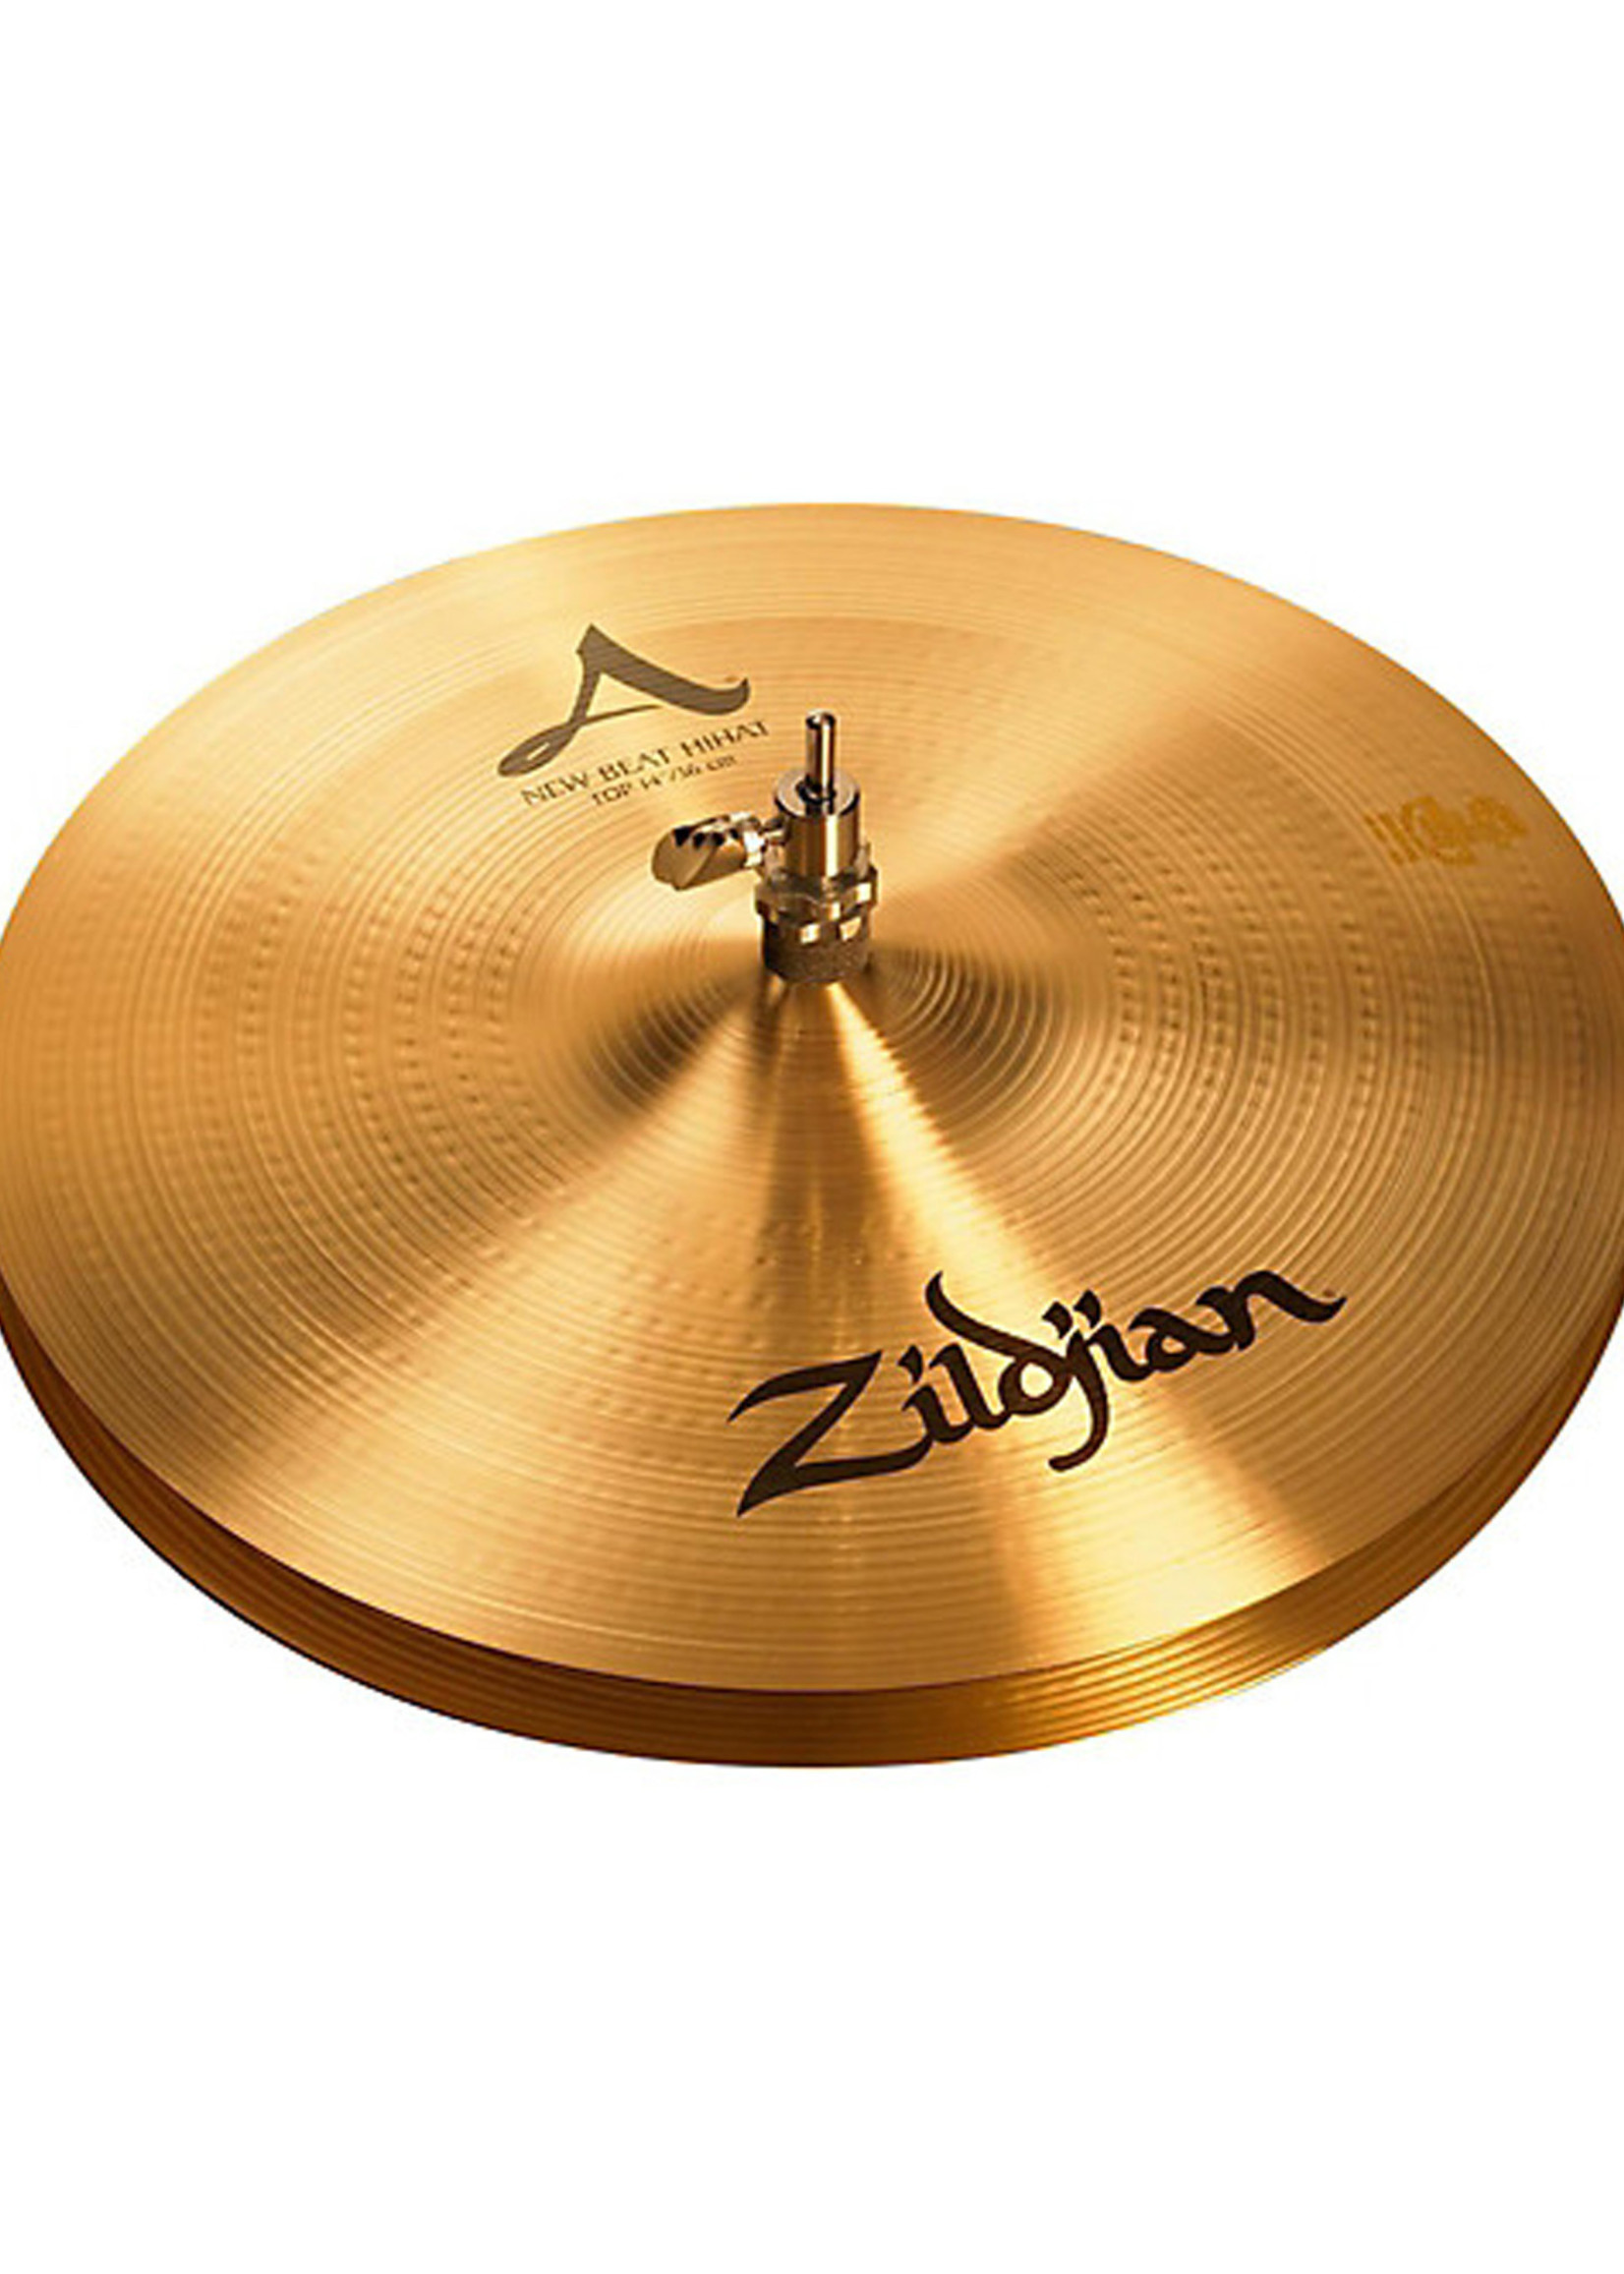 "Zildjian A Series 14"" New Beat Hi-Hat Pair"